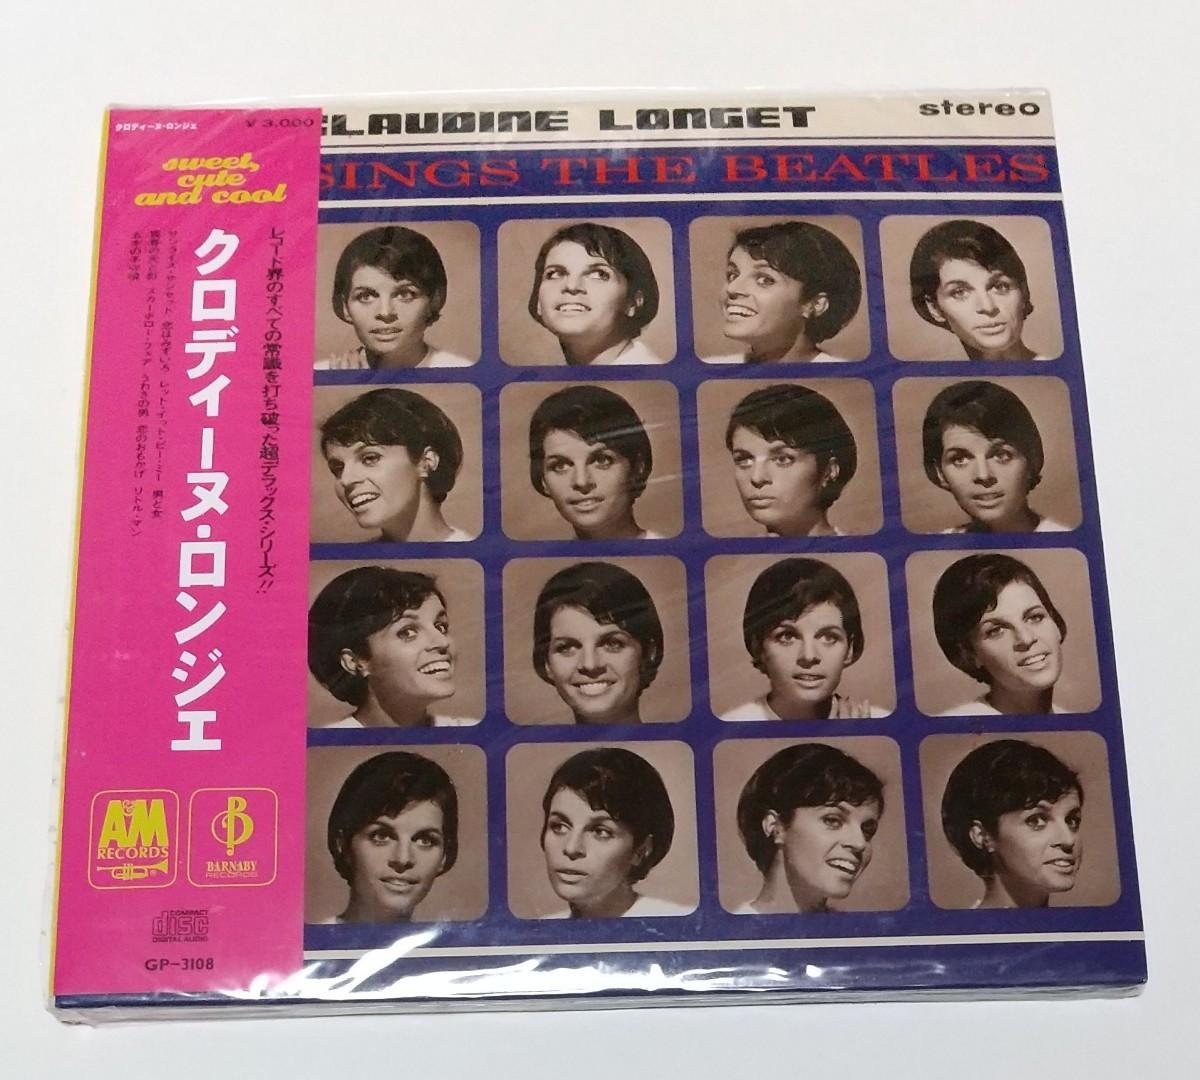 CD未開封 輸入盤リプロ盤 紙ジャケ Claudine Longet Sings The Beatles